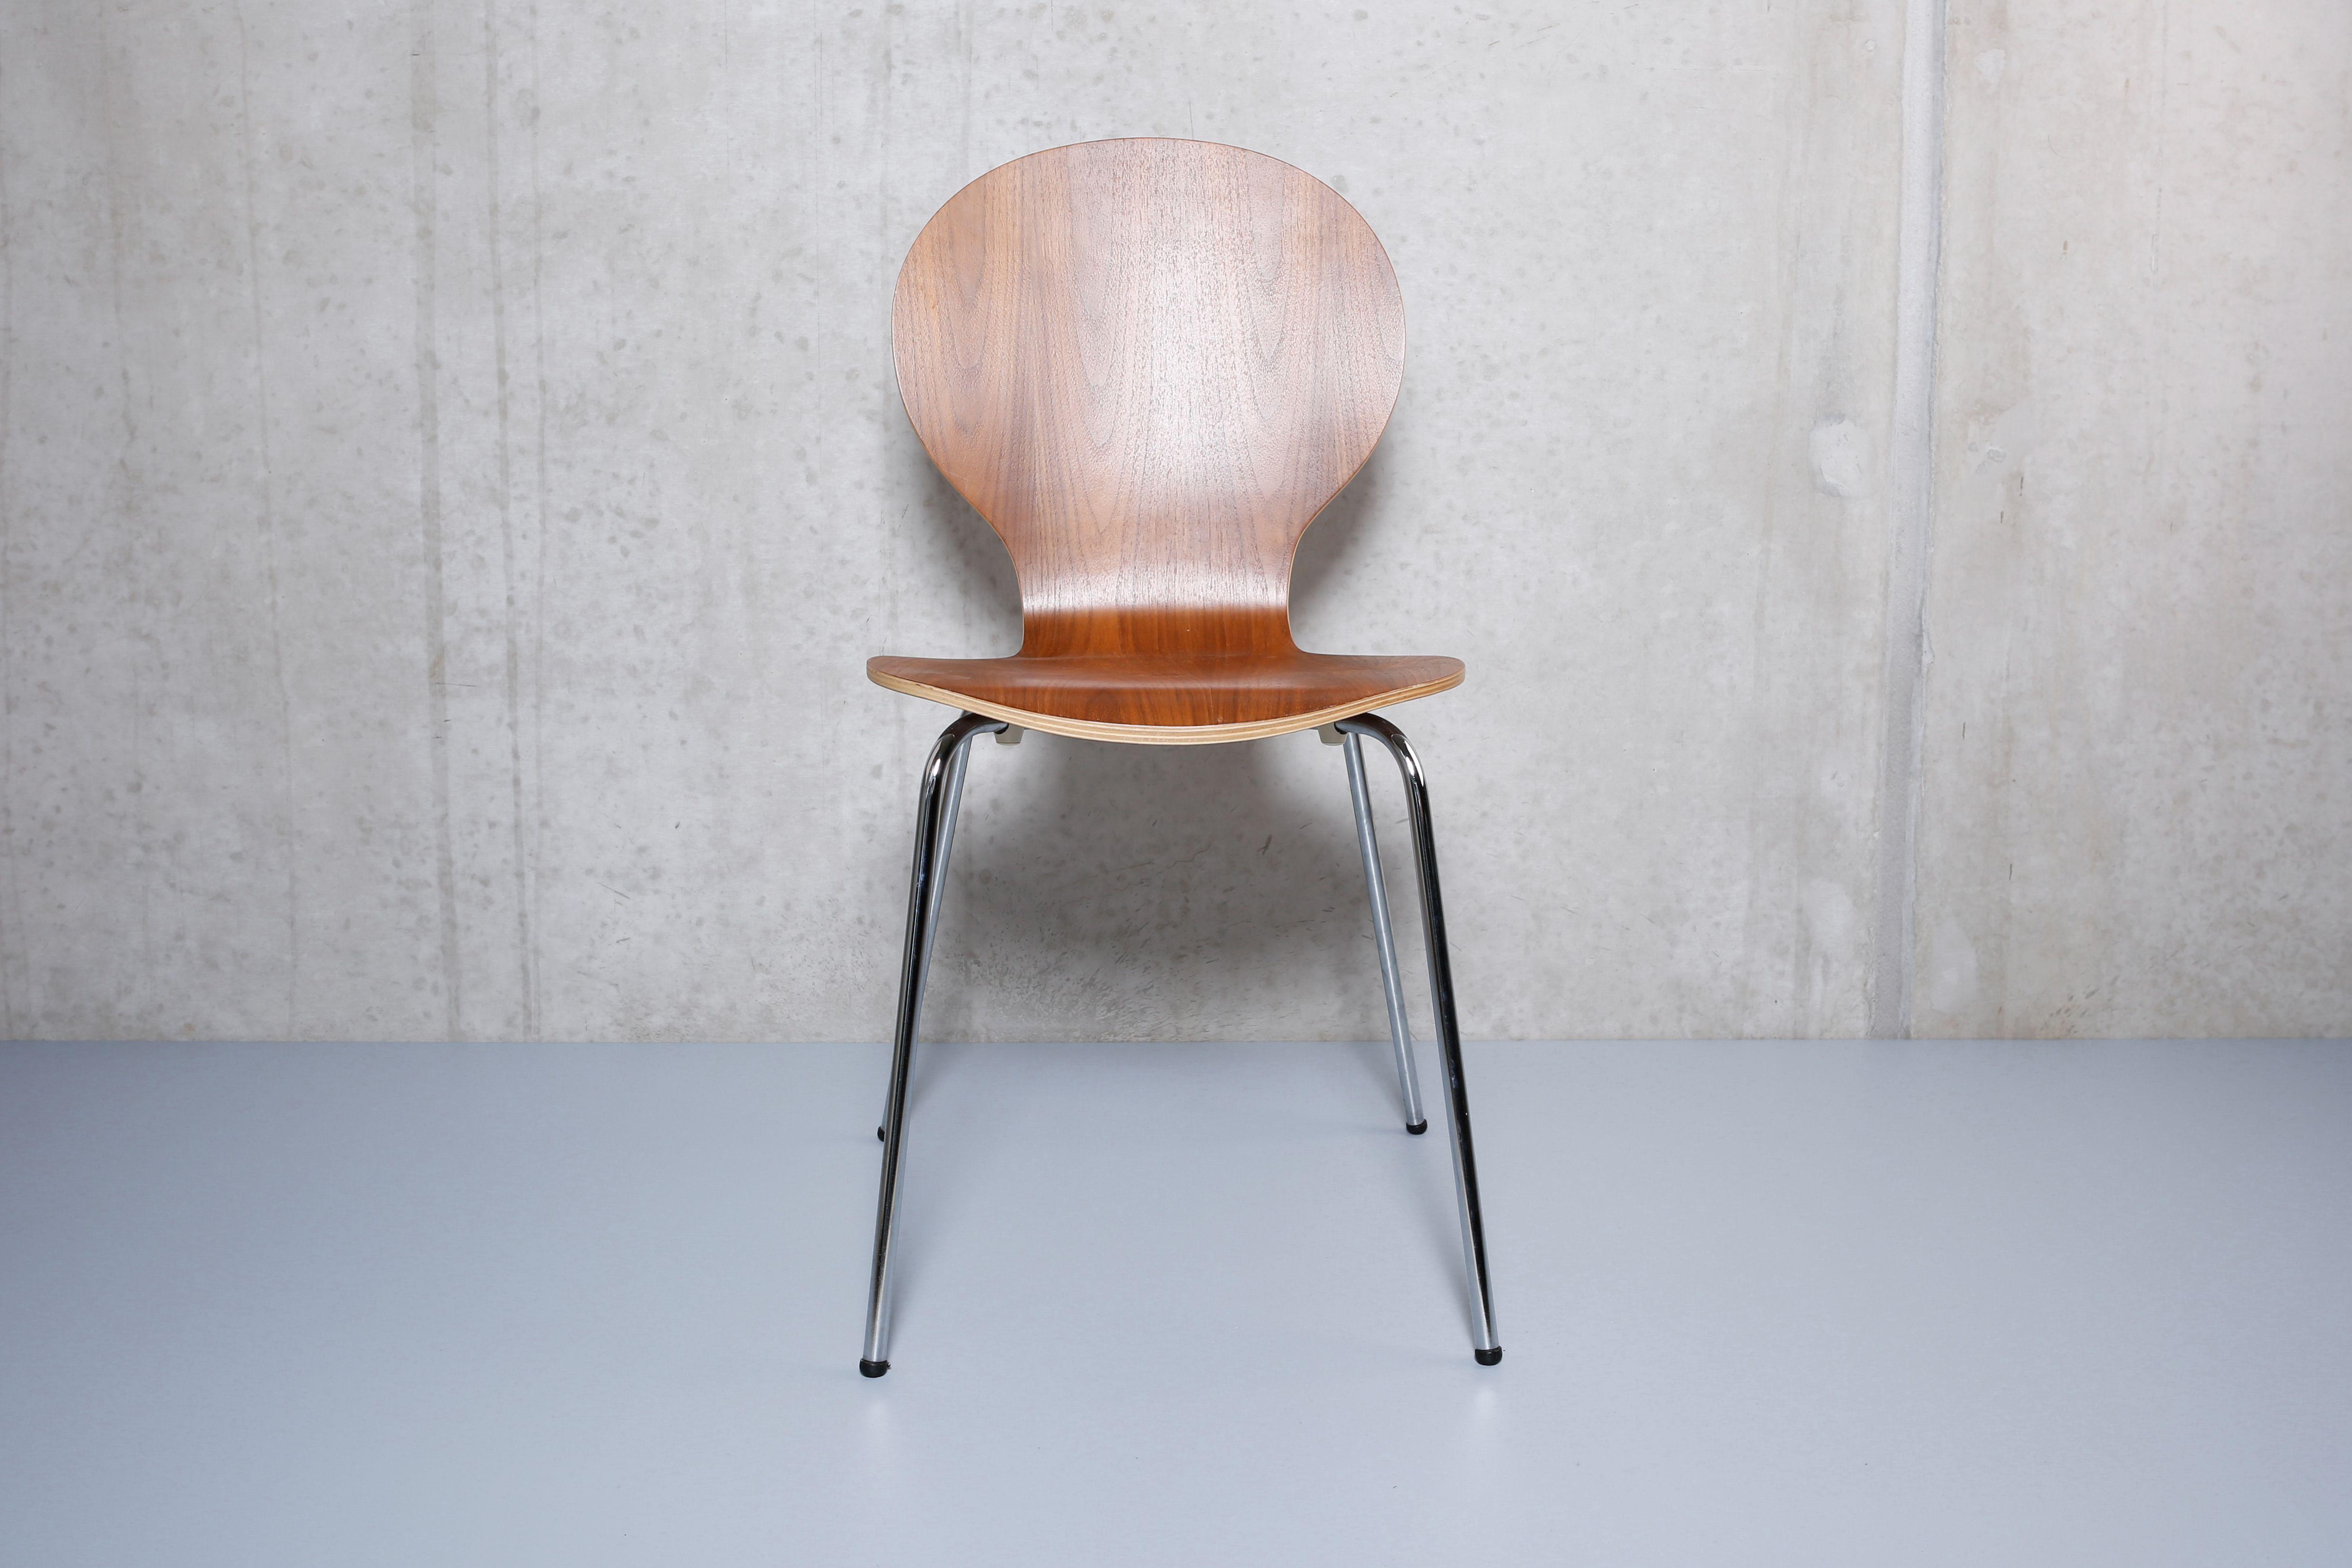 Stuhl Klassiker Holz stahlrohr holz stuhl klassiker nachbau verchromte stahlrohrbeine